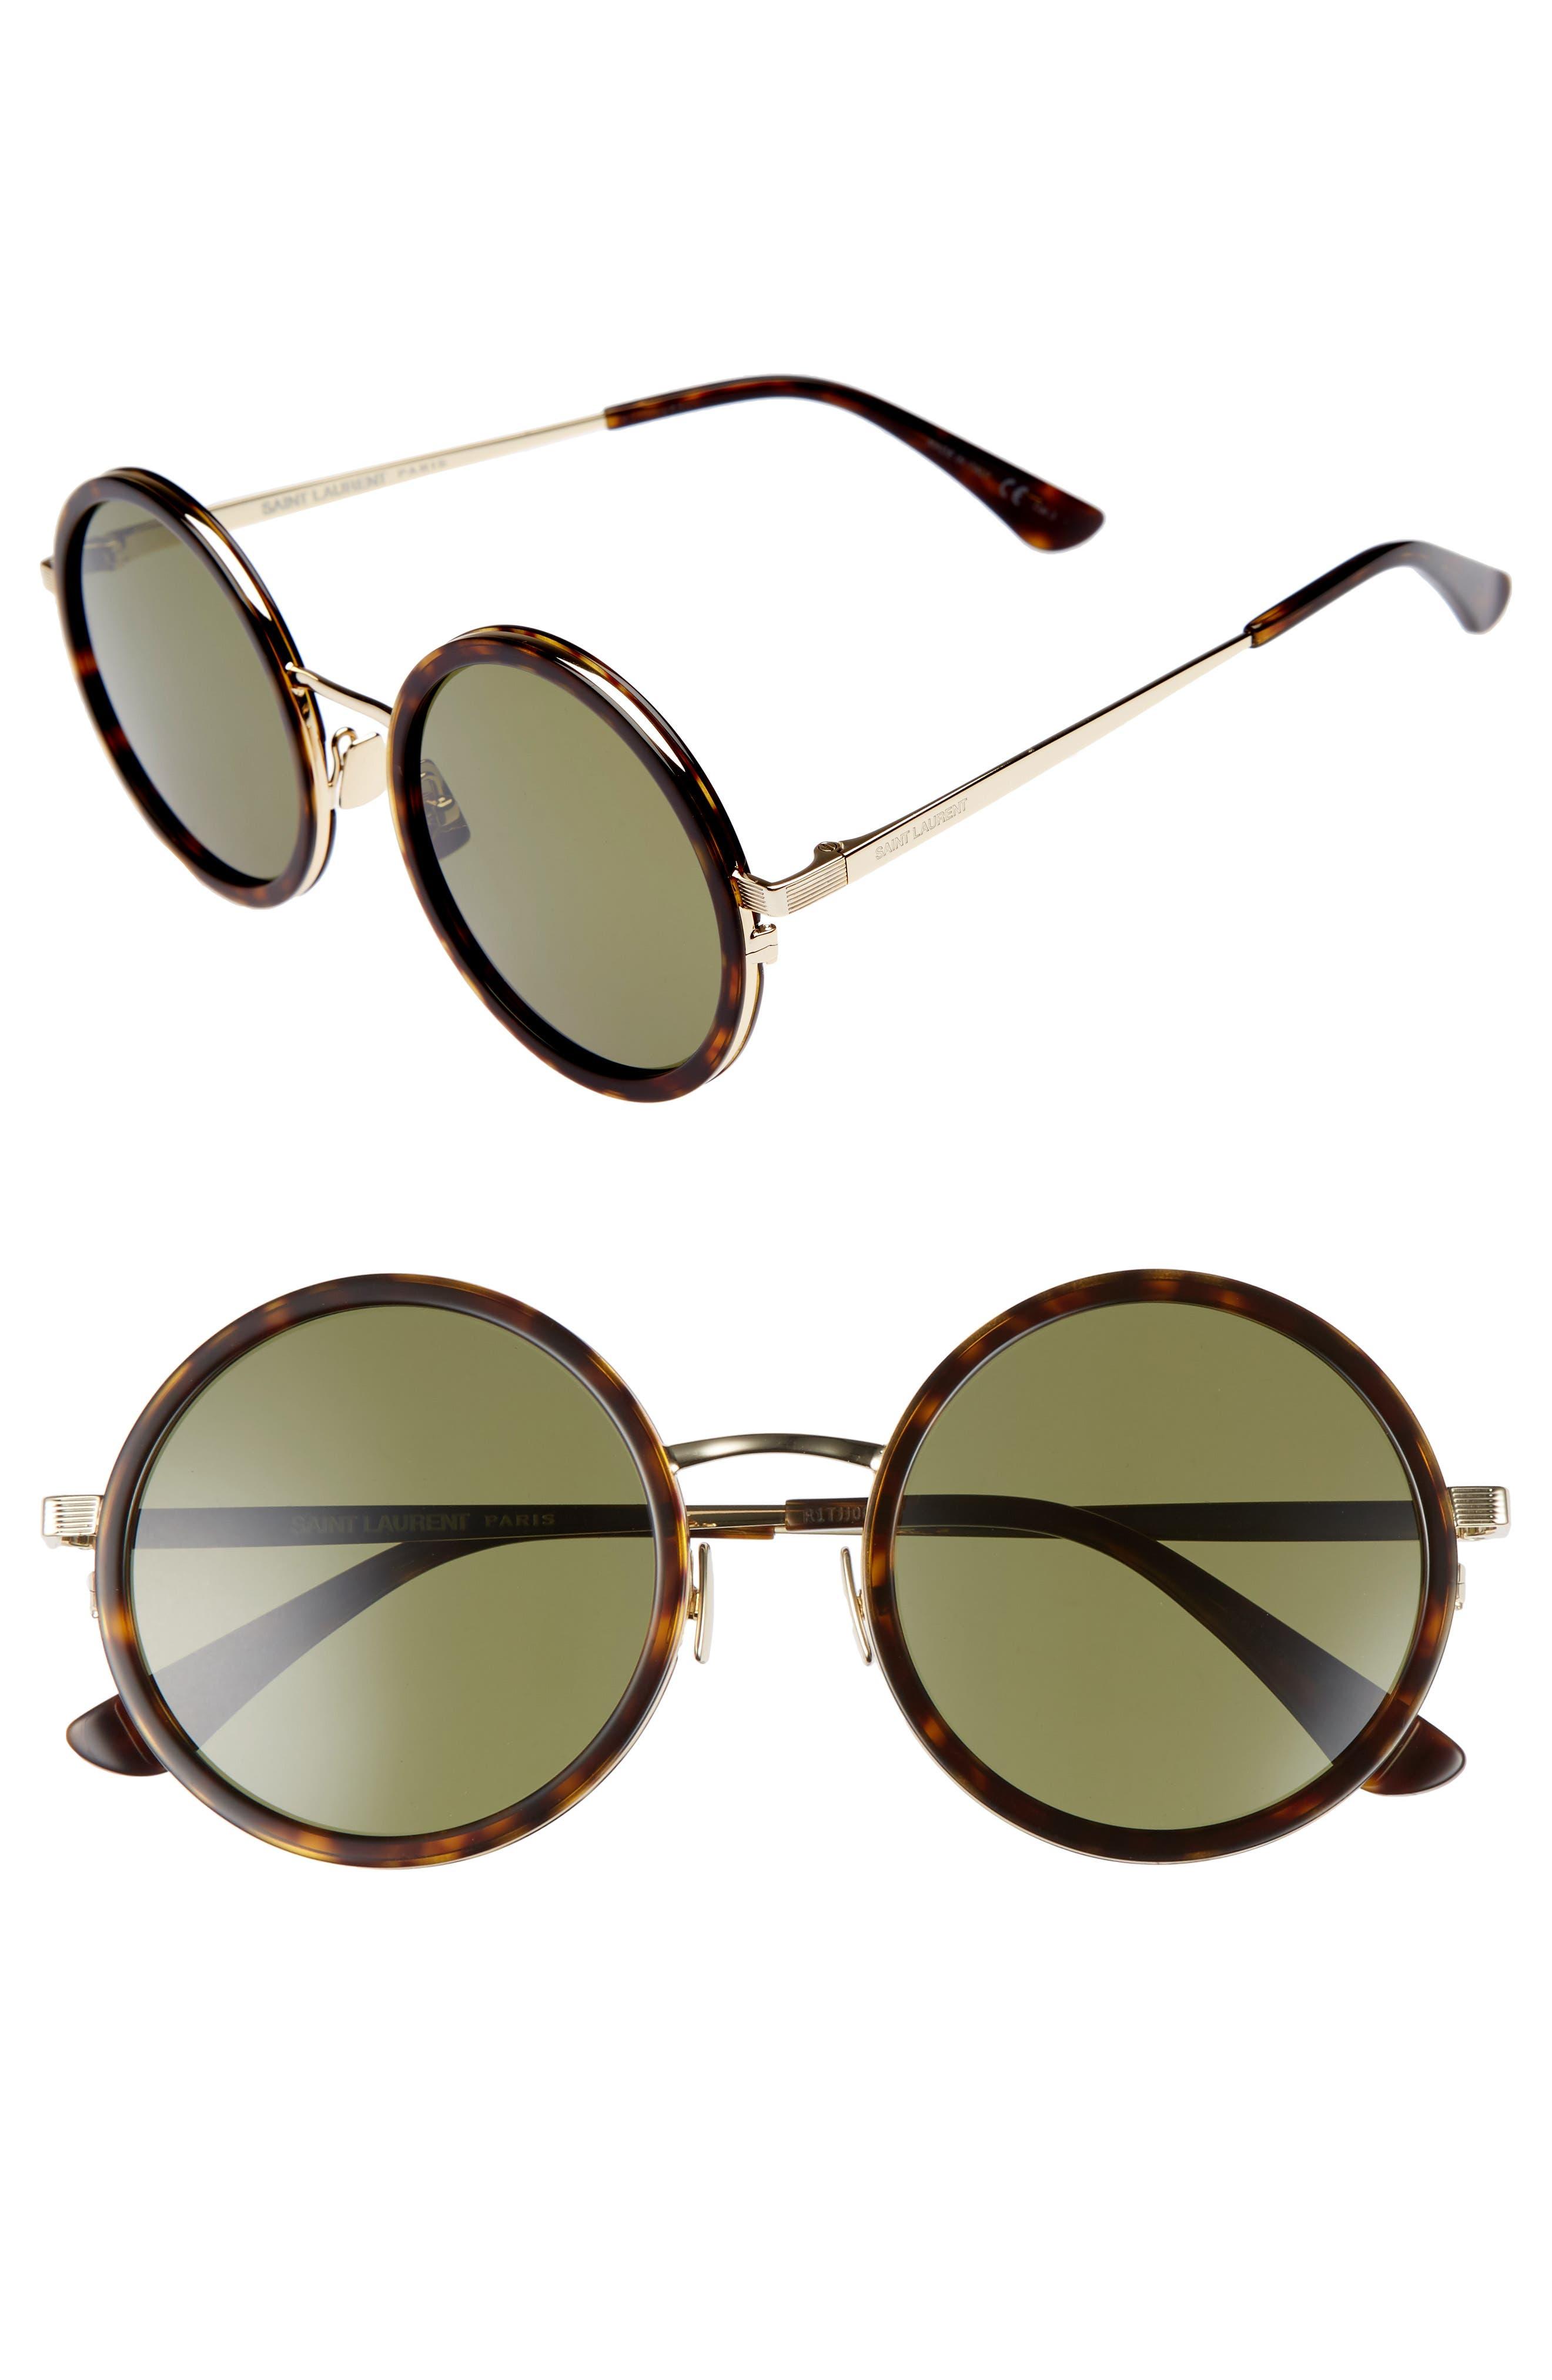 52mm Round Sunglasses,                         Main,                         color, 200